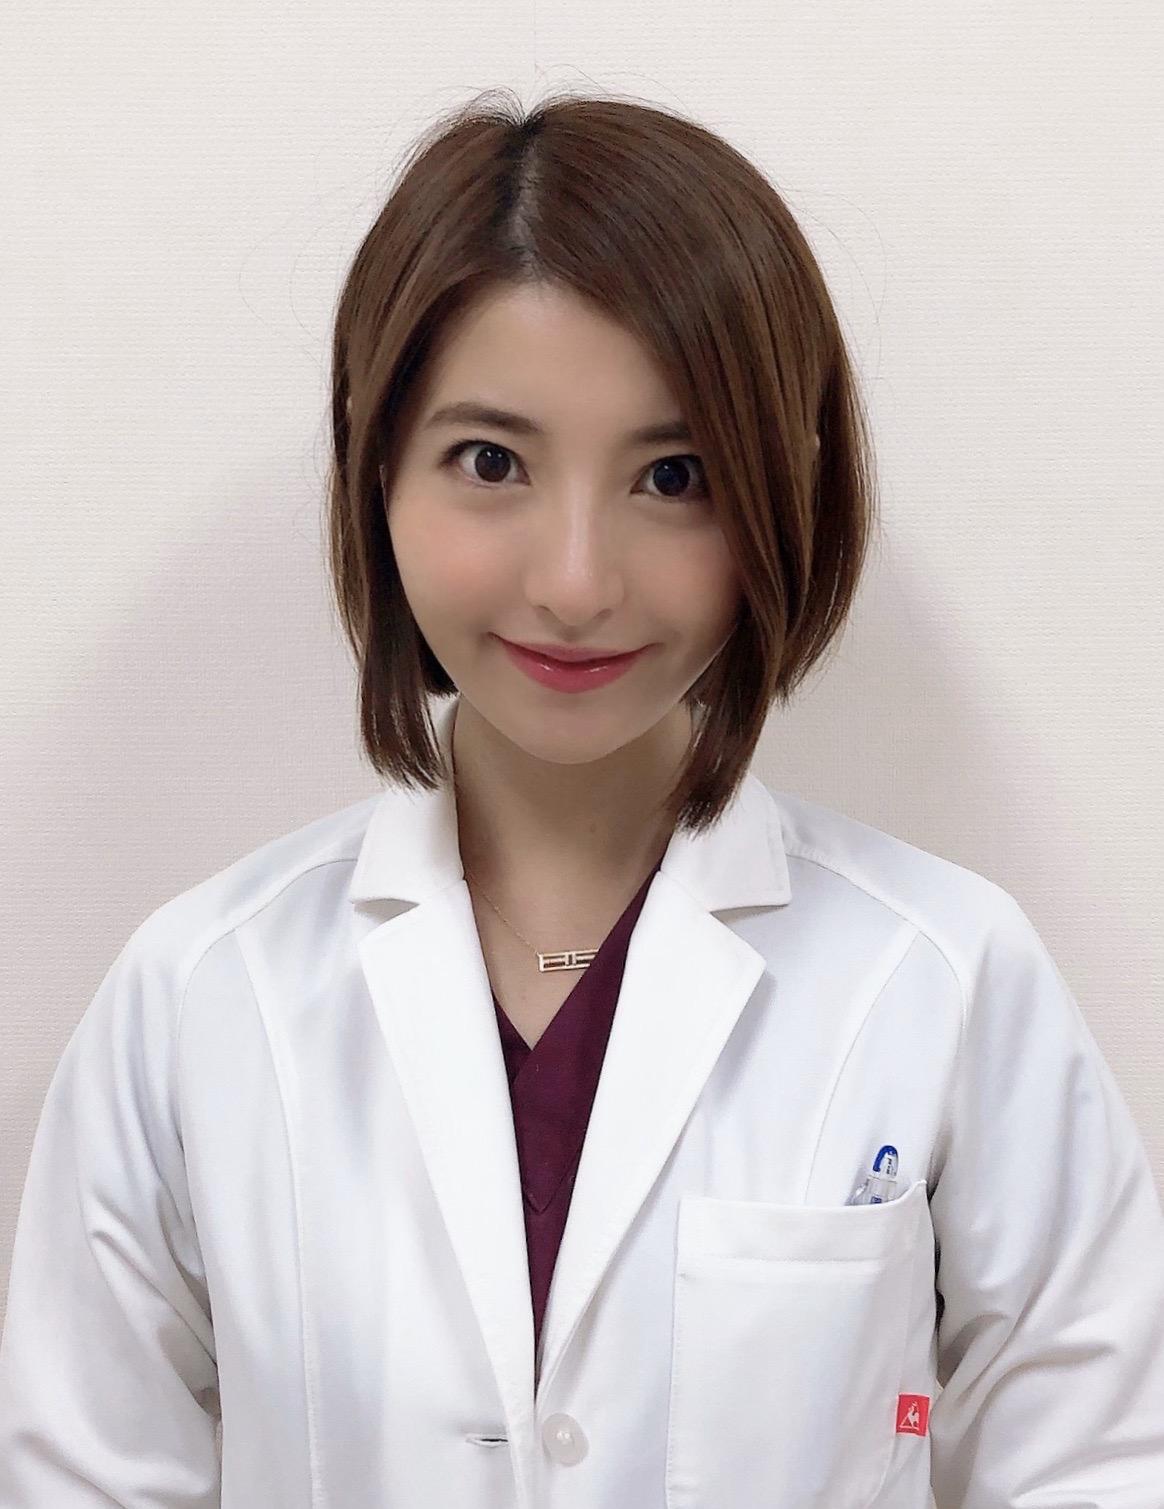 KonomiKimura